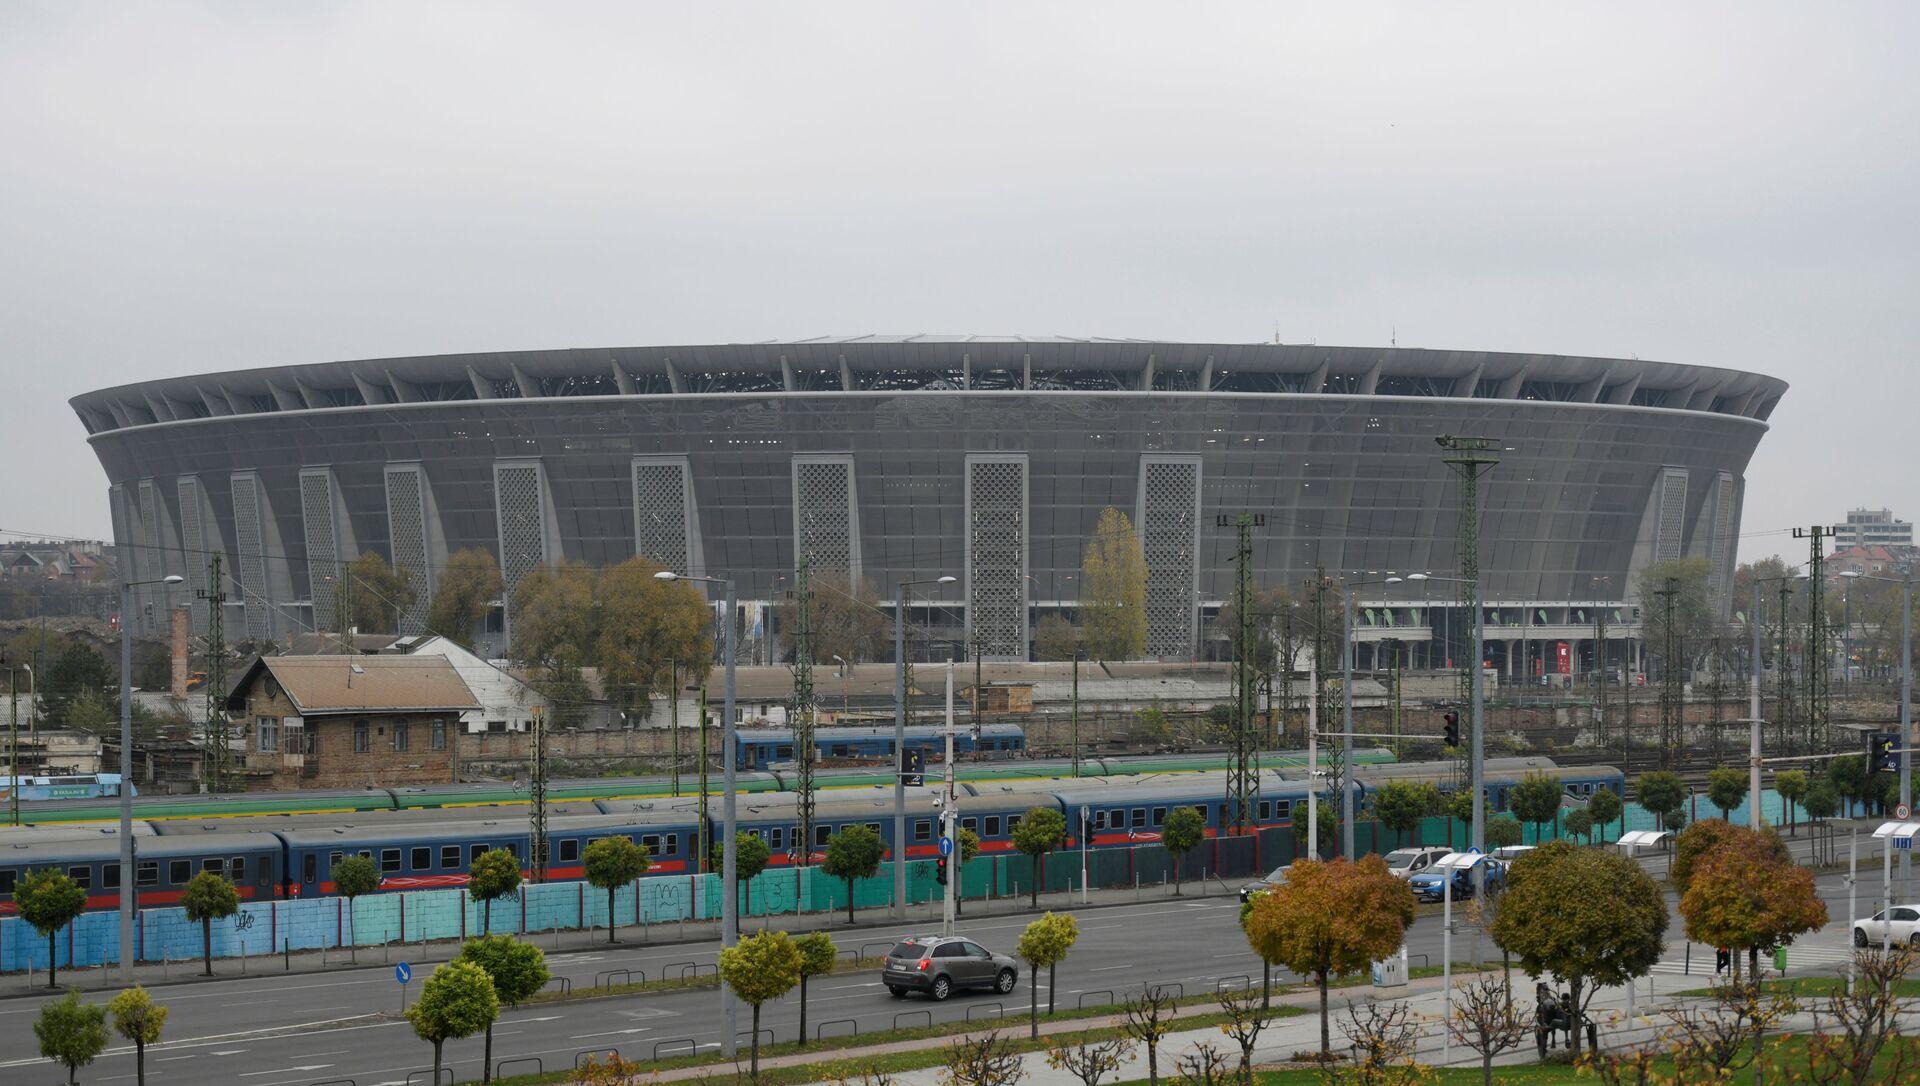 Стадион Пушкаш Арена в Будапеште - Sputnik Азербайджан, 1920, 09.04.2021